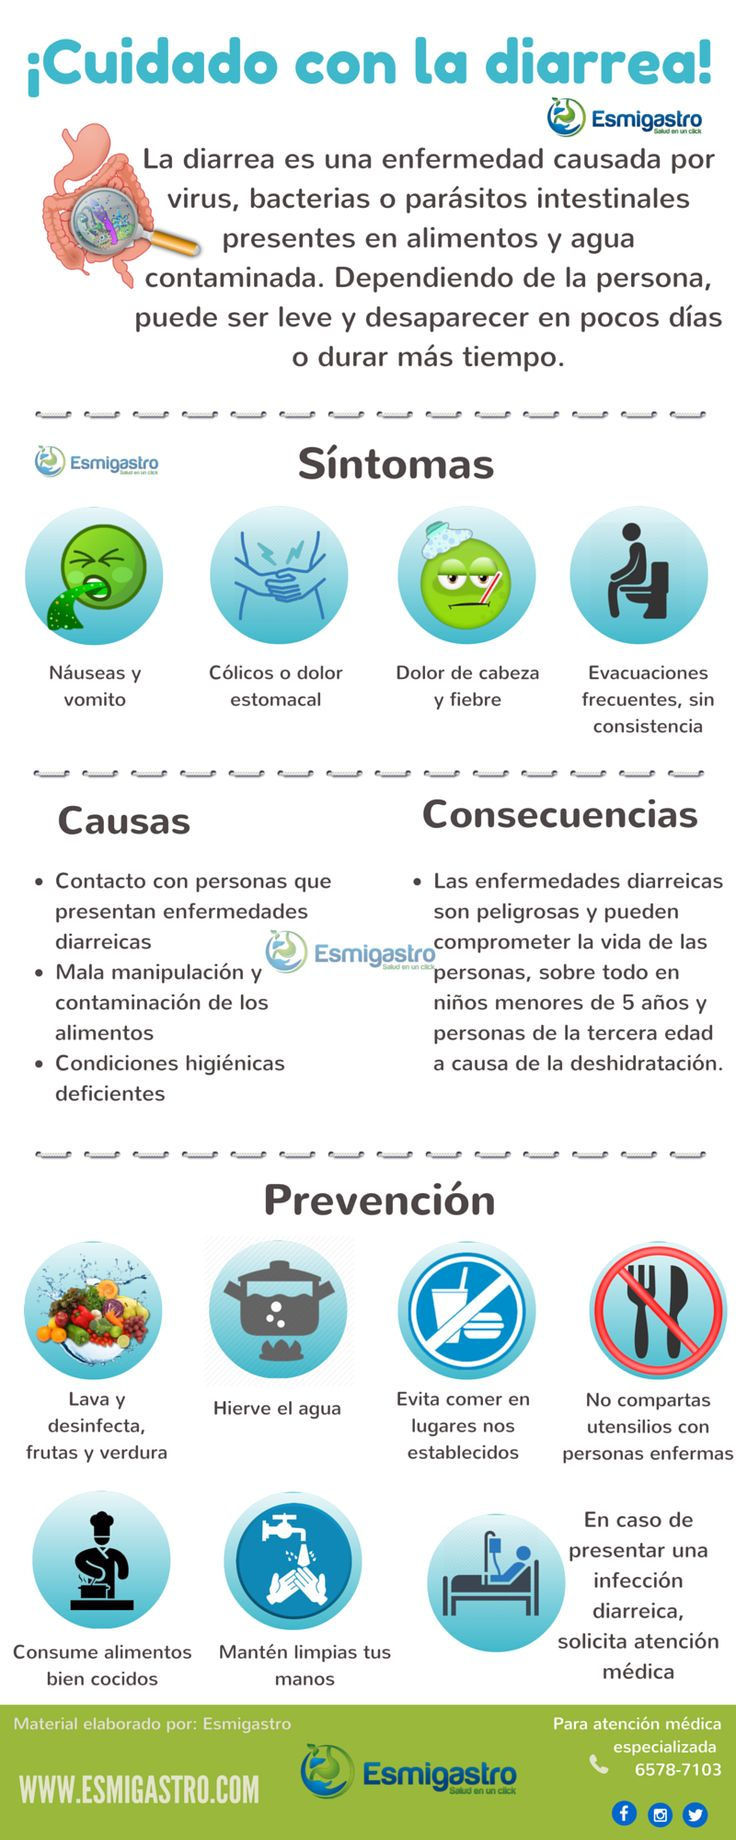 9560 best images about Salud en infografías on Pinterest